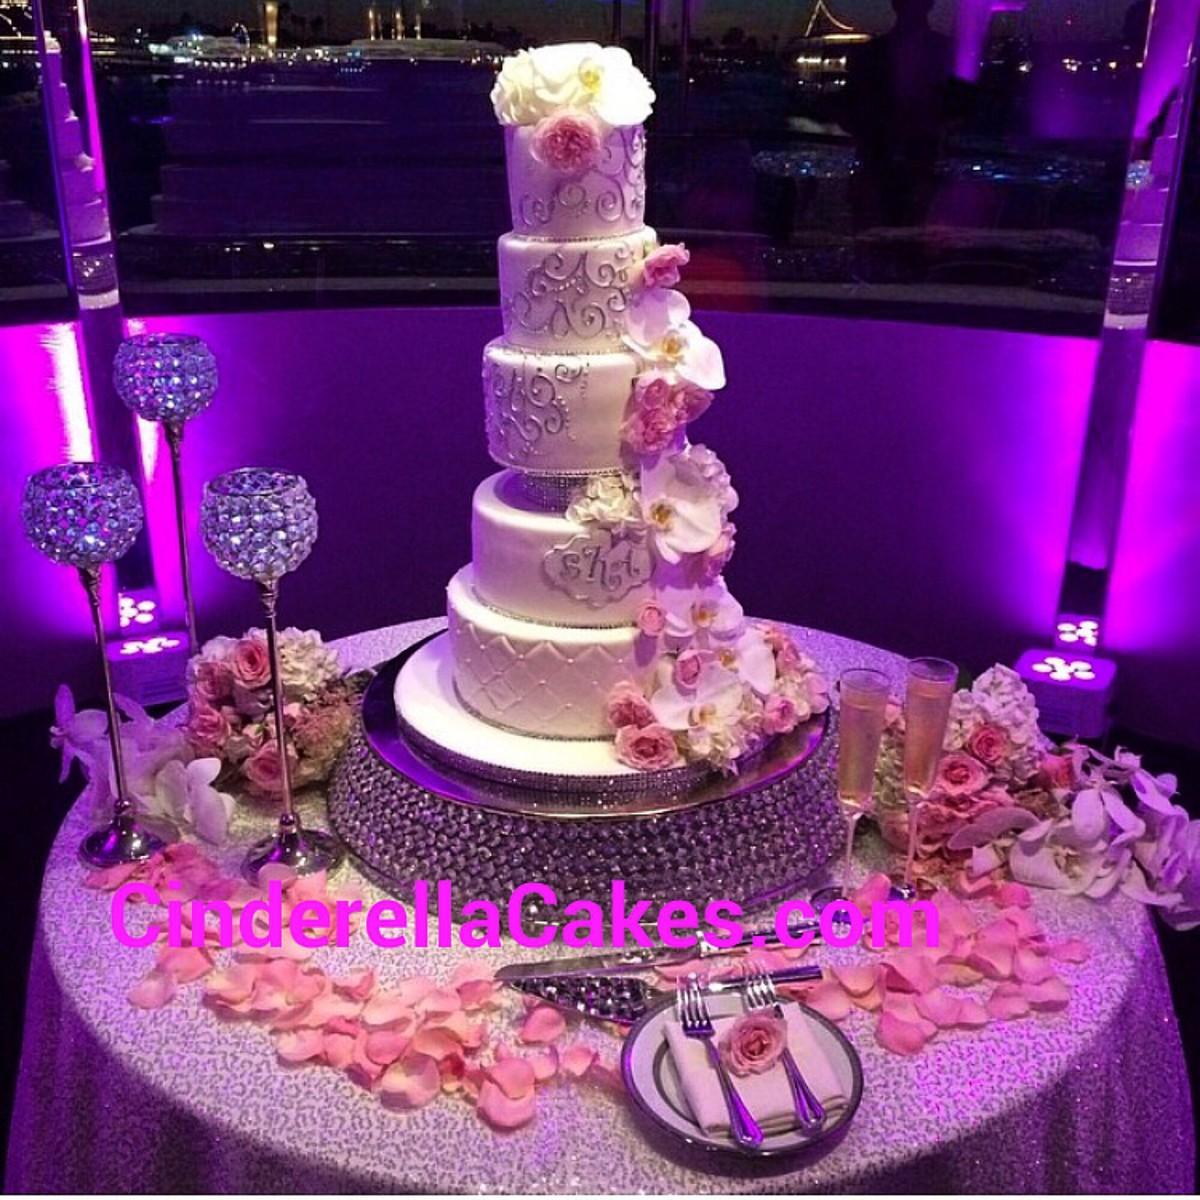 Wedding Cakes Orange County: Cinderella Cakes Photos, Wedding Cake Pictures, California